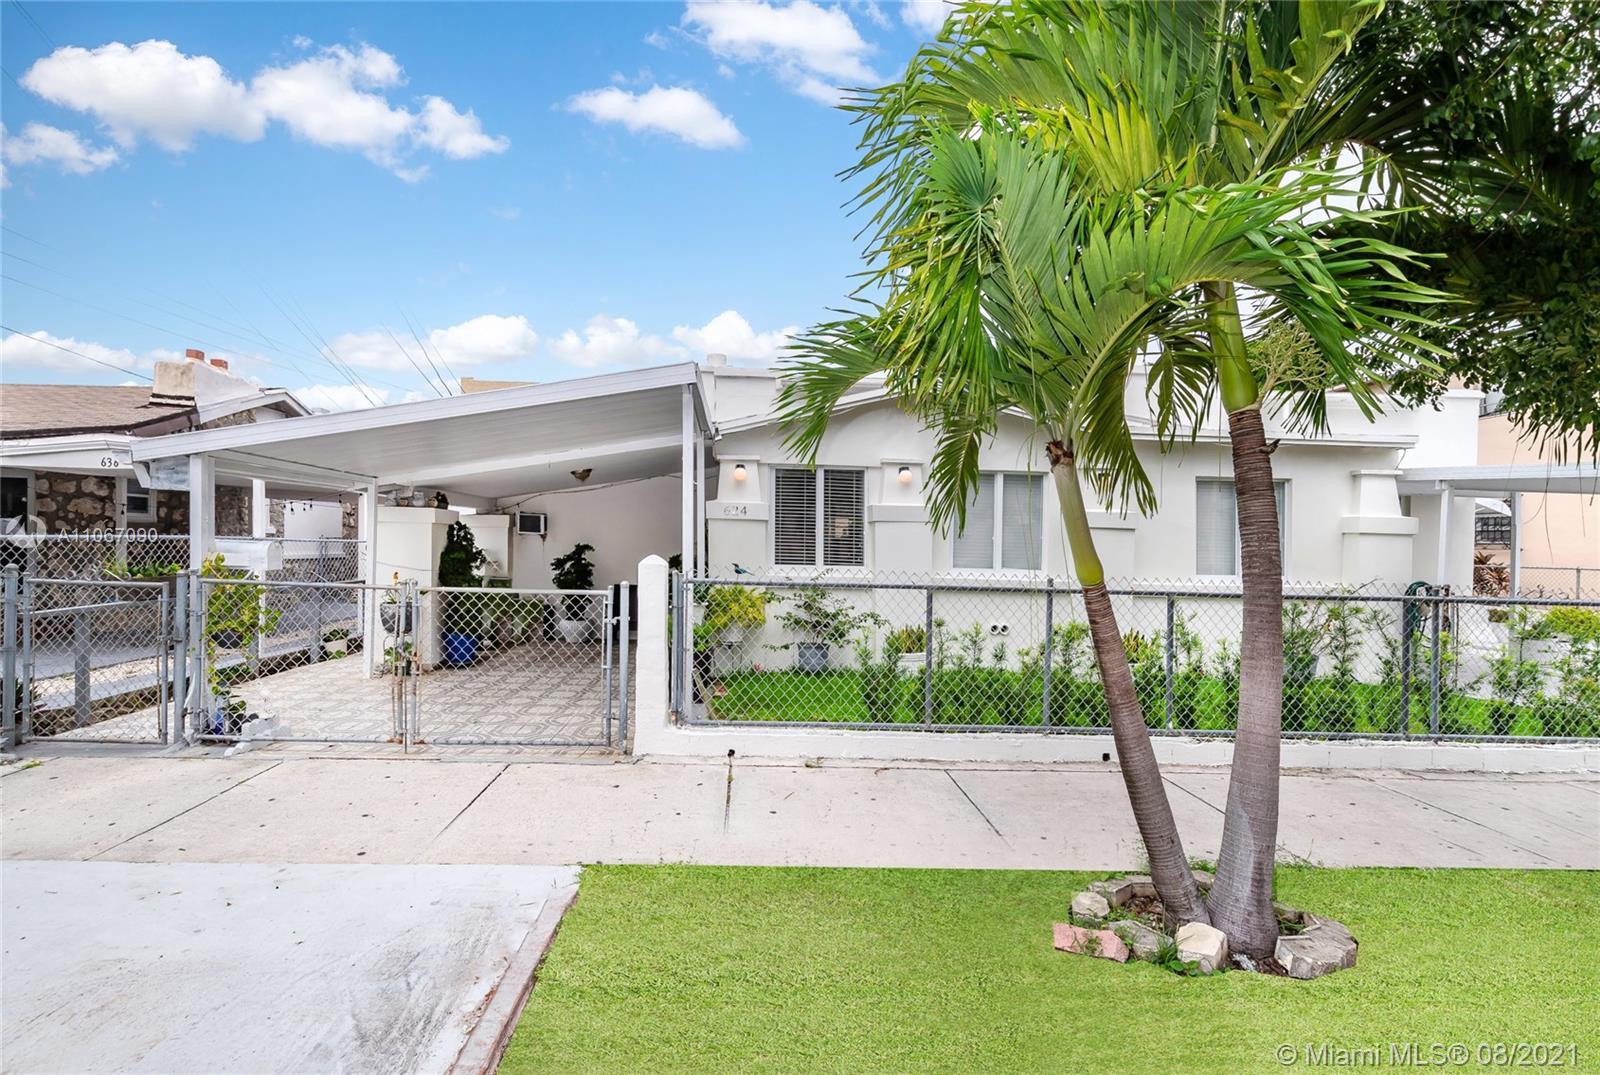 Single Family Home,For Sale,624 SW 18th Ave, Miami, Florida 33135,Brickell,realty,broker,condos near me